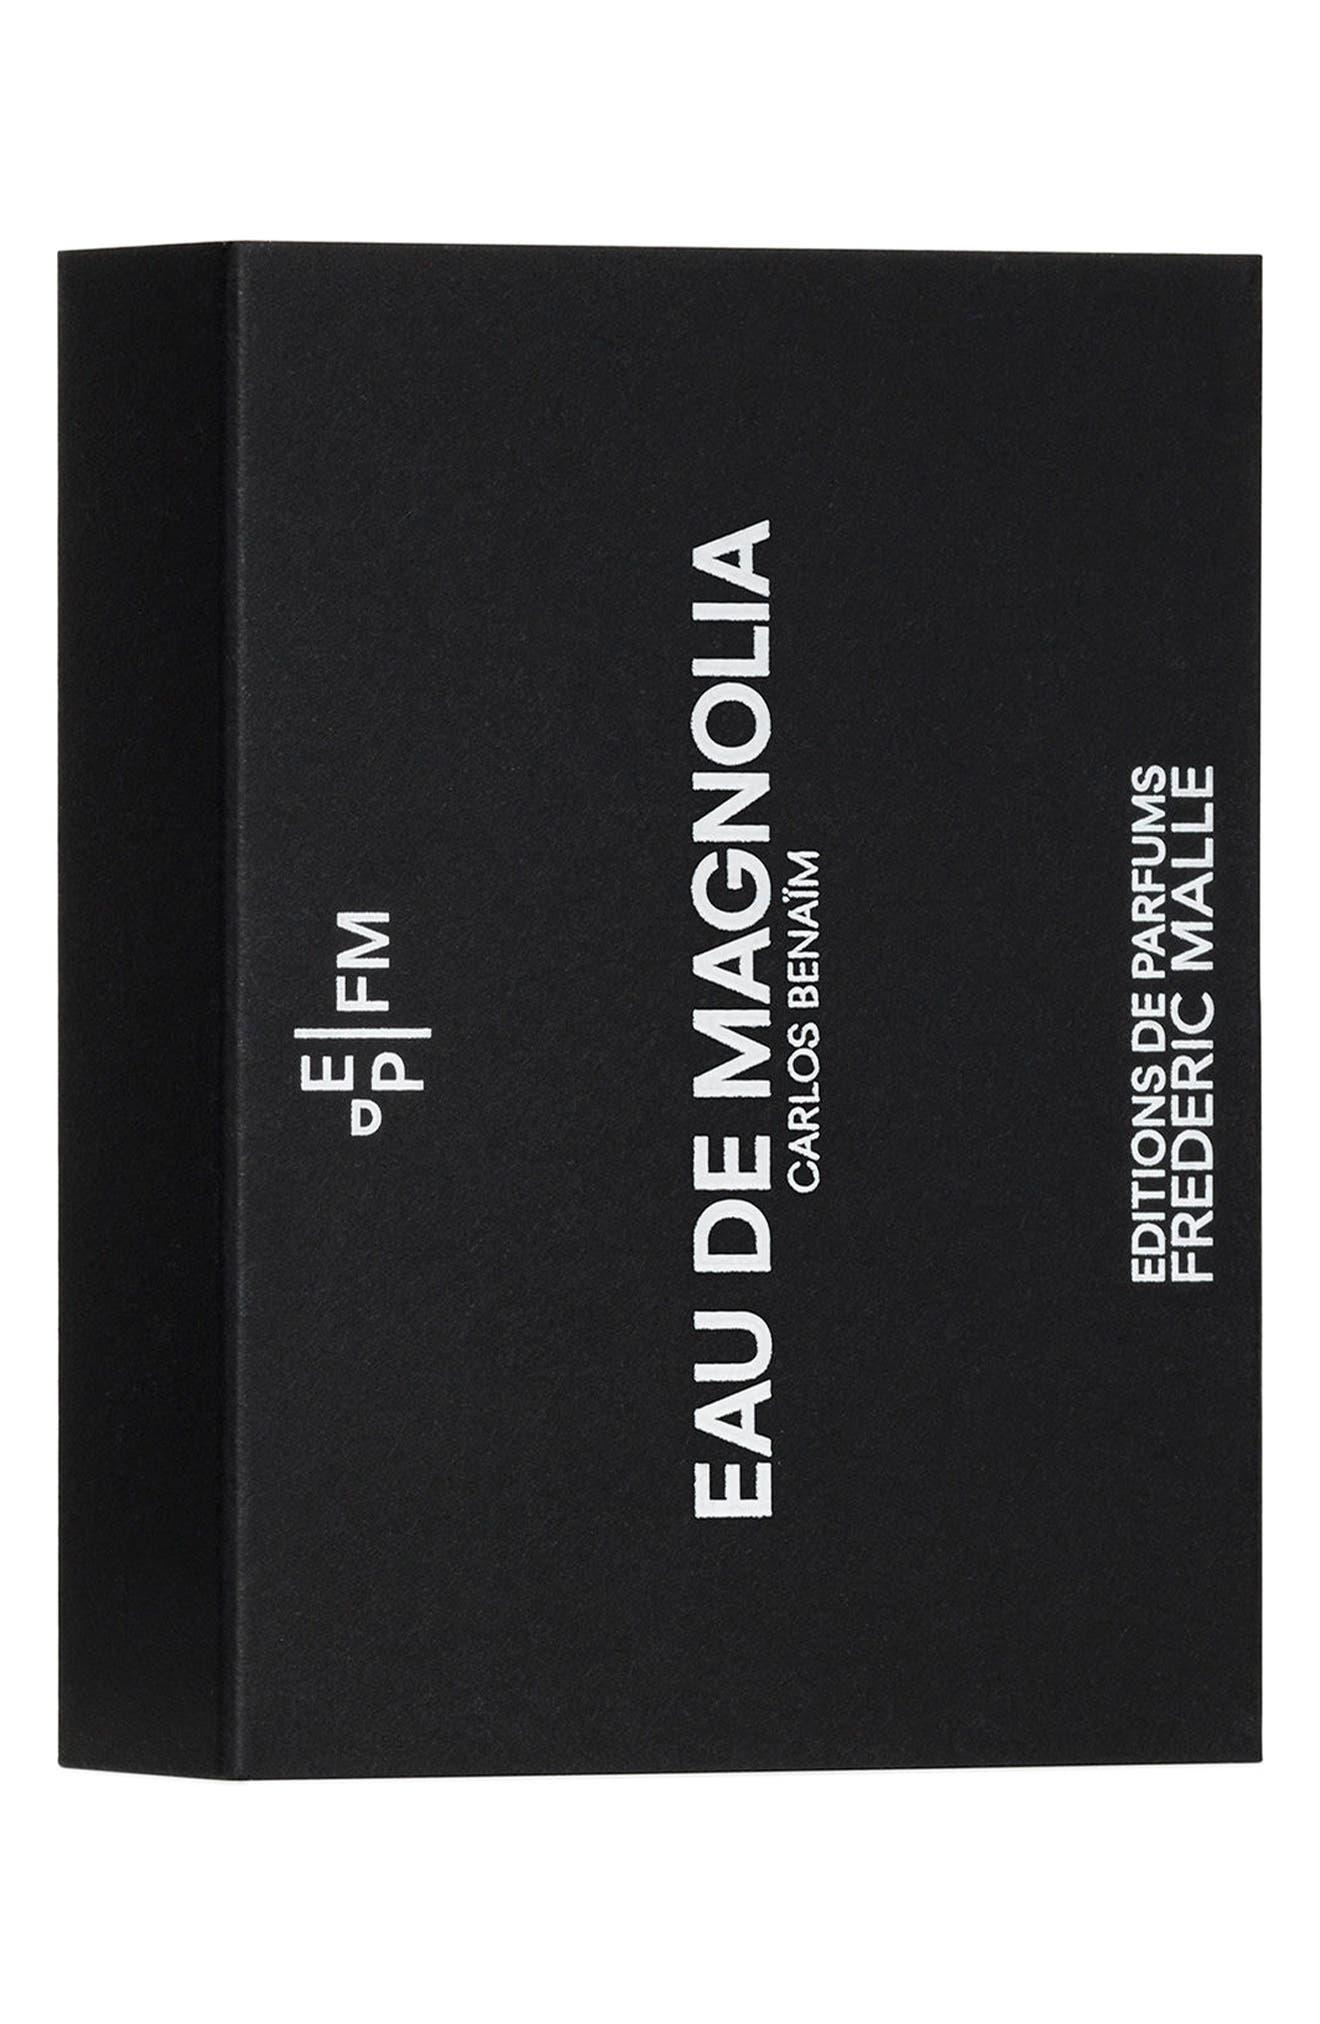 Editions de Parfums Frédéric Malle Eau de Magnolia Fragrance Travel Spray Trio,                             Alternate thumbnail 3, color,                             NO COLOR